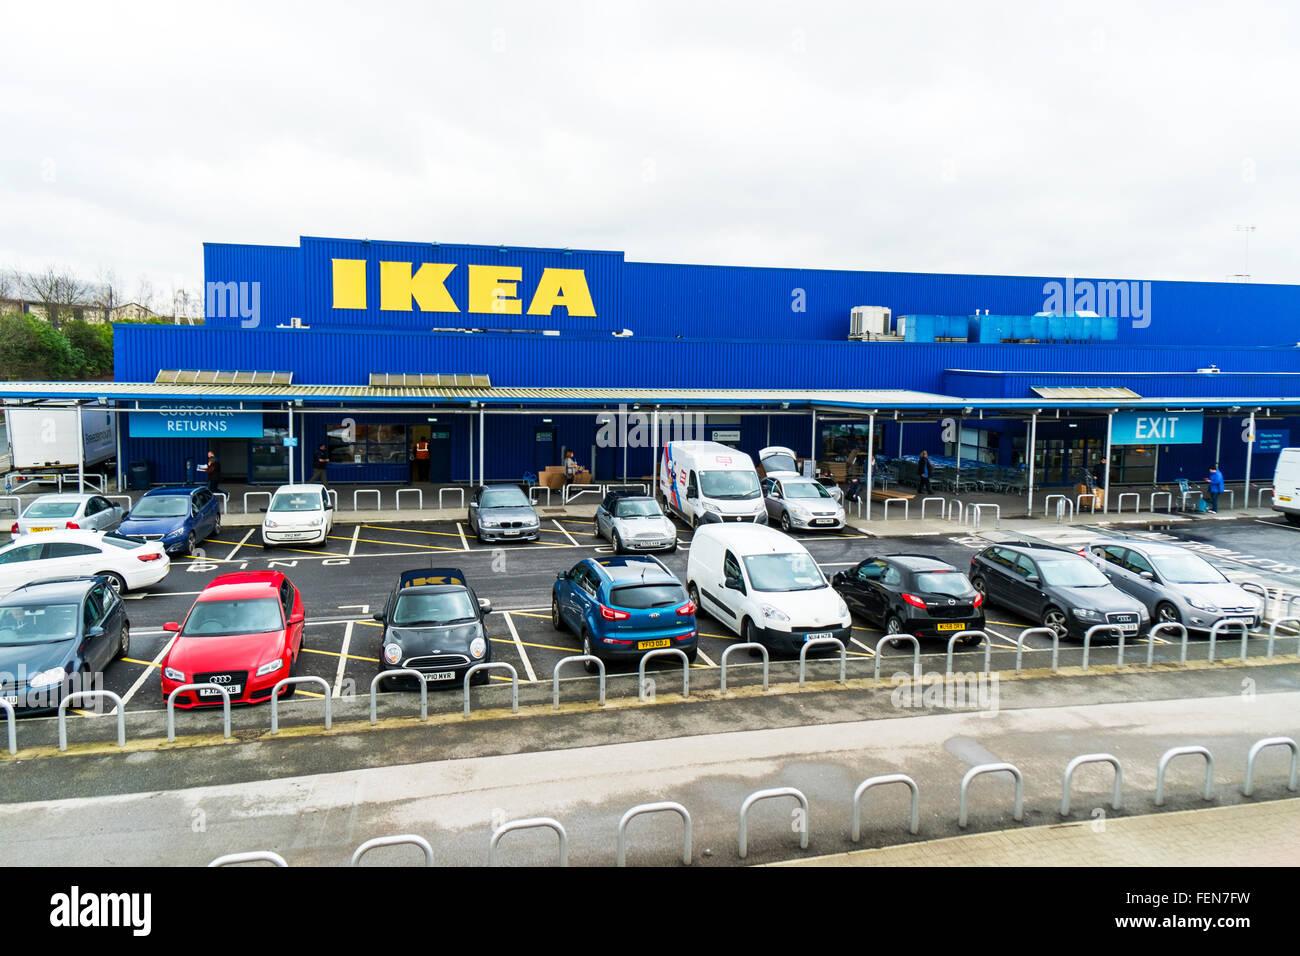 Ikea store sign leeds Birstall retail park Batley UK England Scandinavian shop shopping - Stock Image